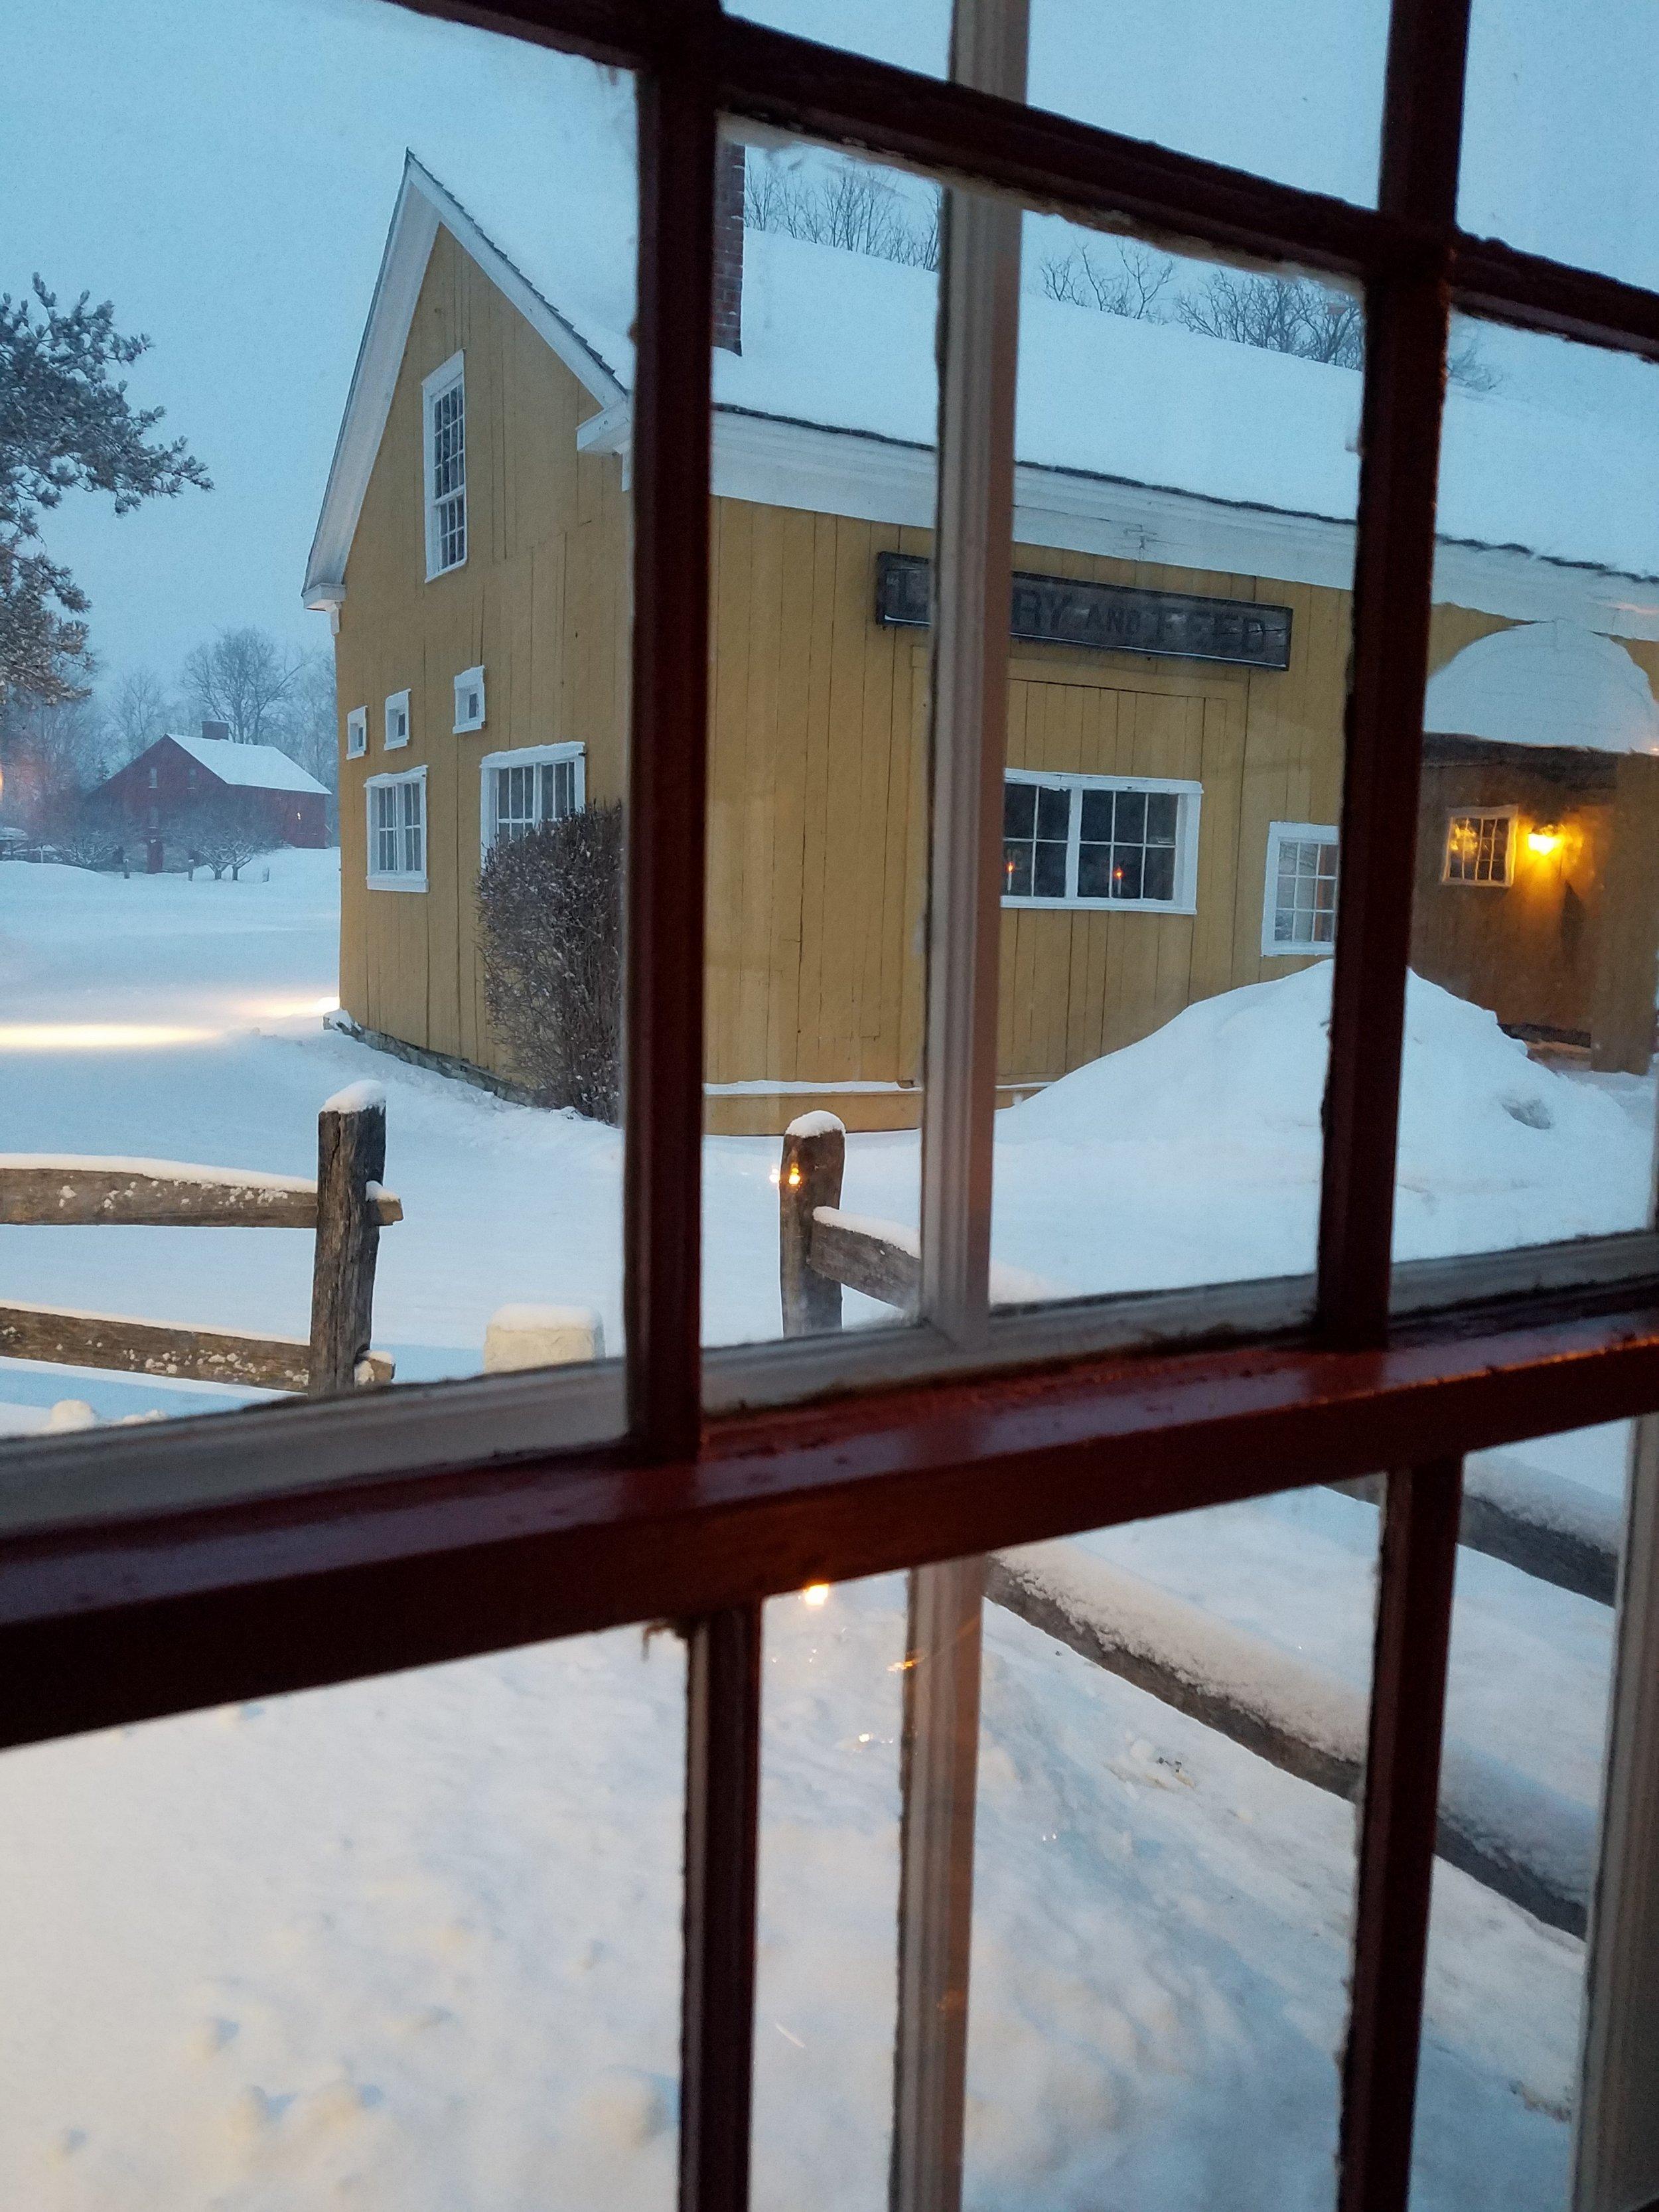 Table 32 lookin out window toward barn with snow.jpg